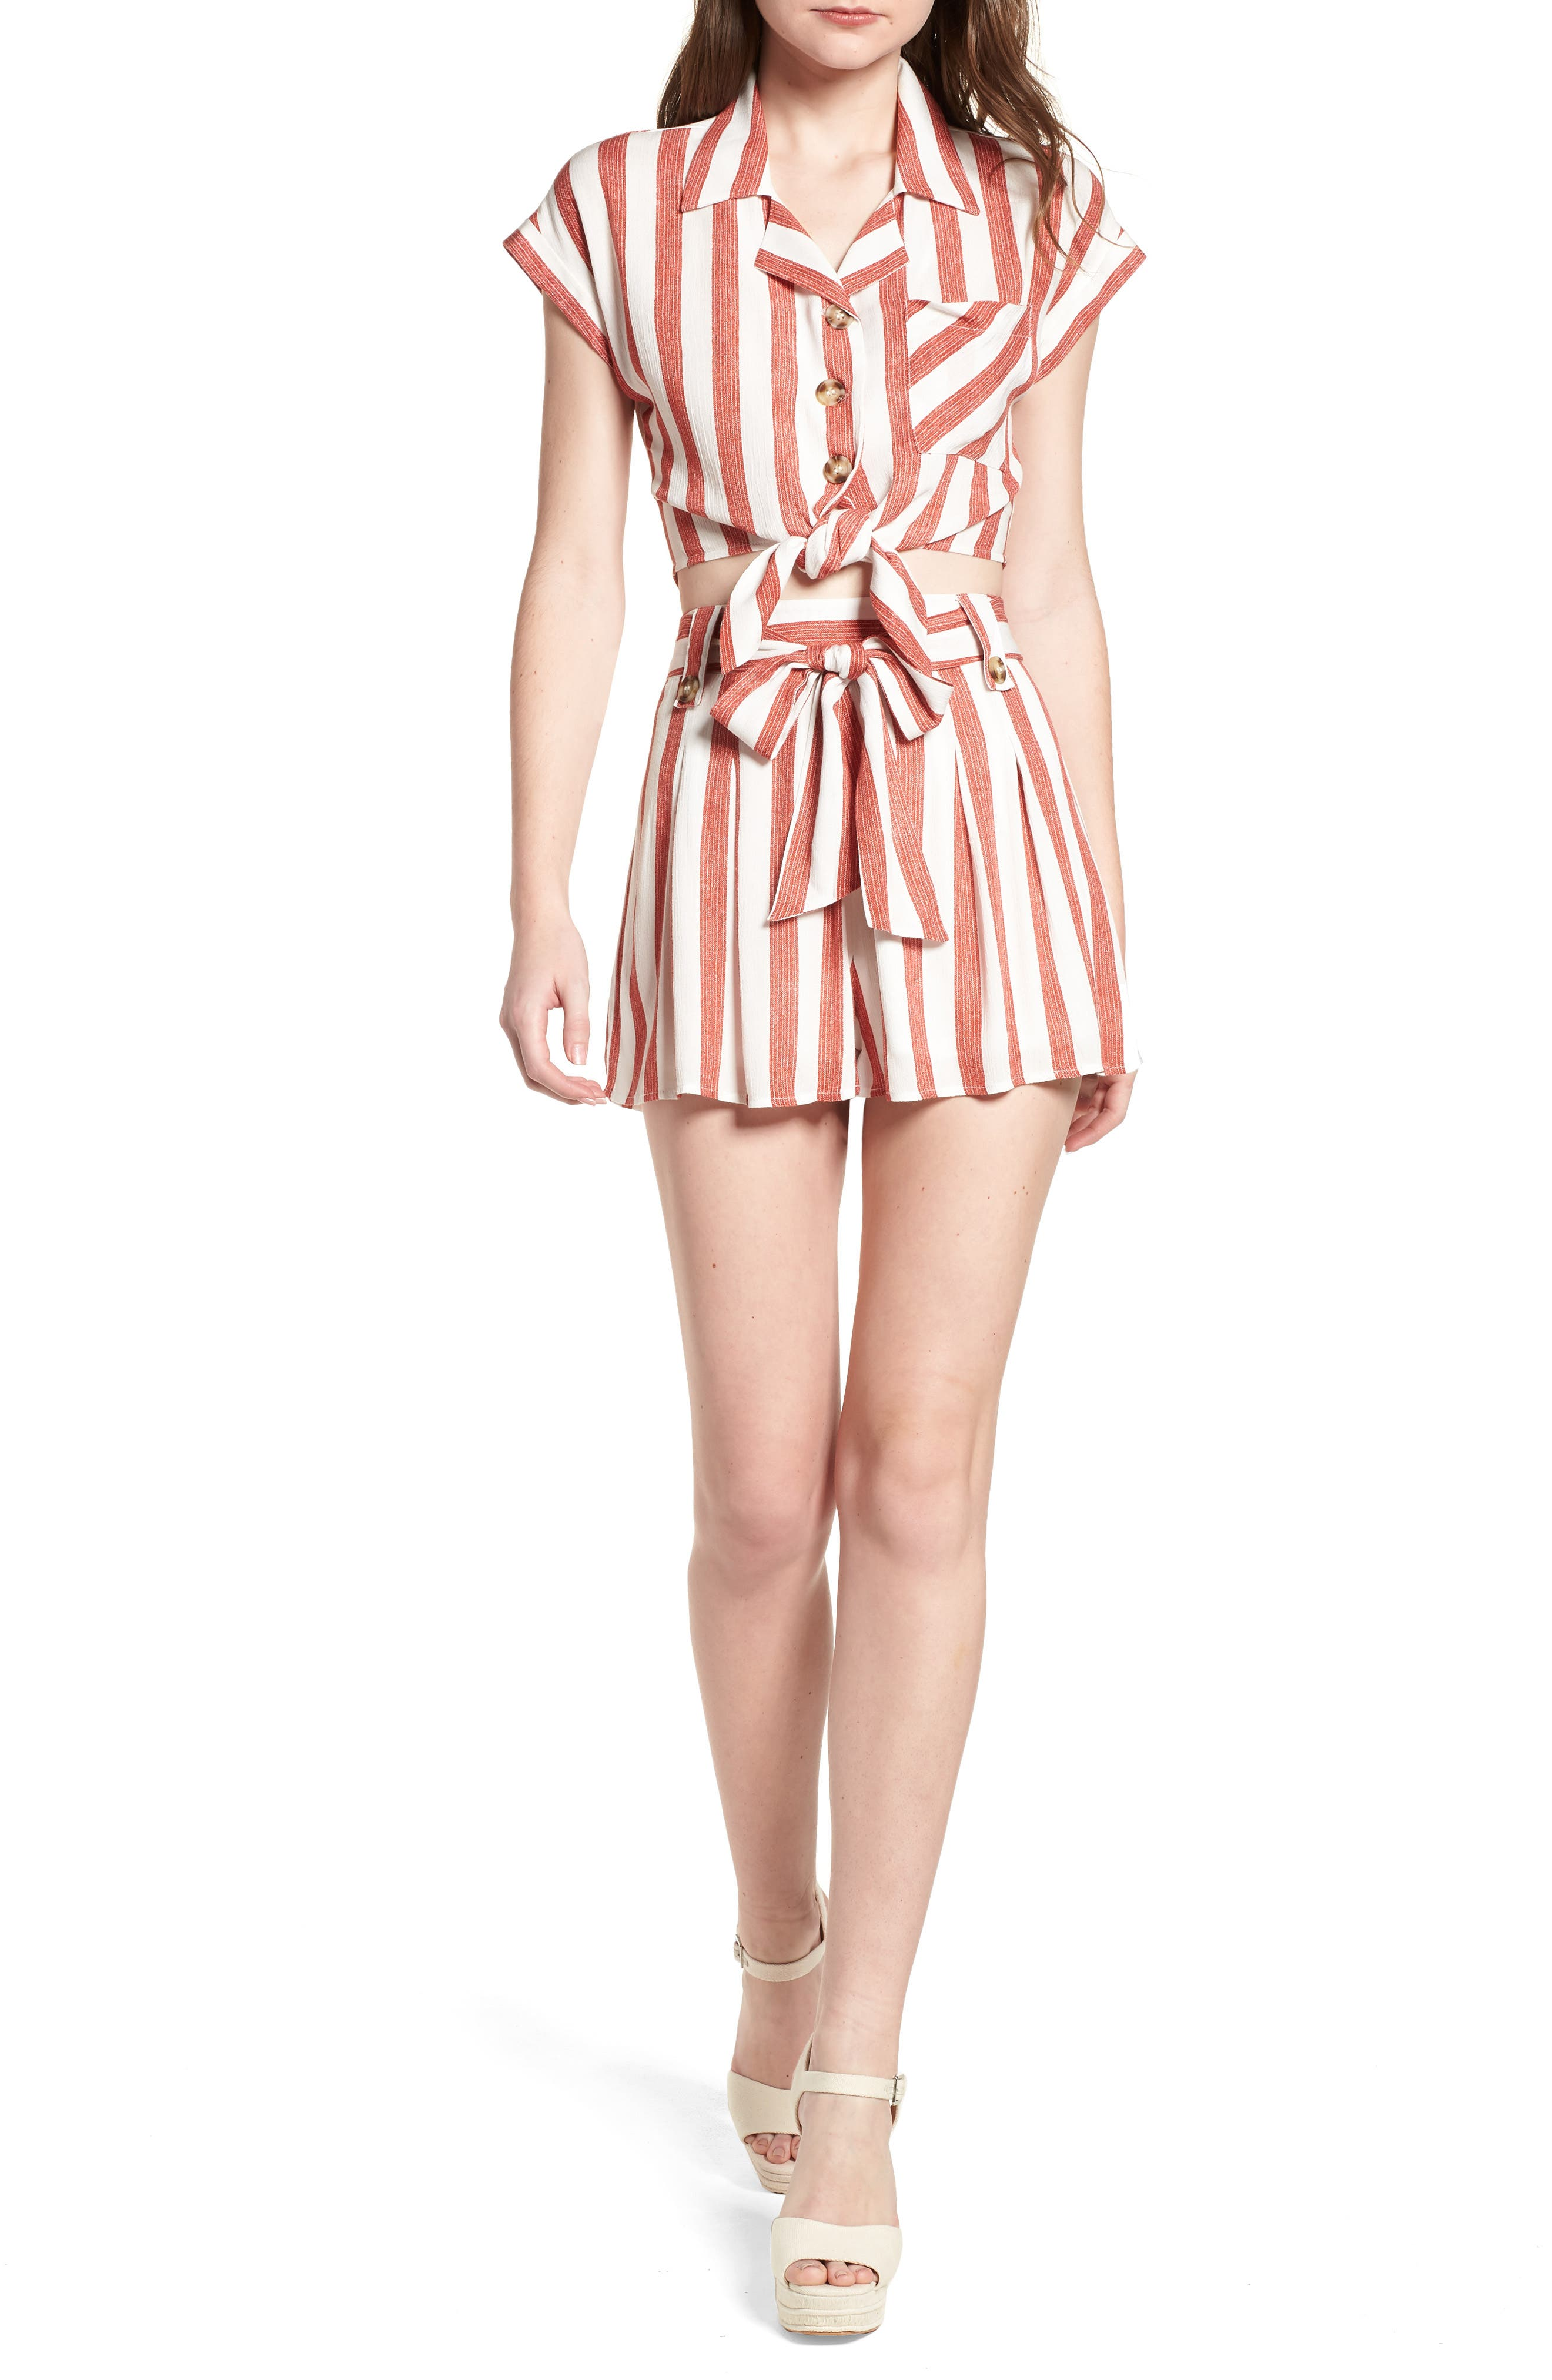 Stripe Shorts,                             Alternate thumbnail 2, color,                             Red/ Ivory